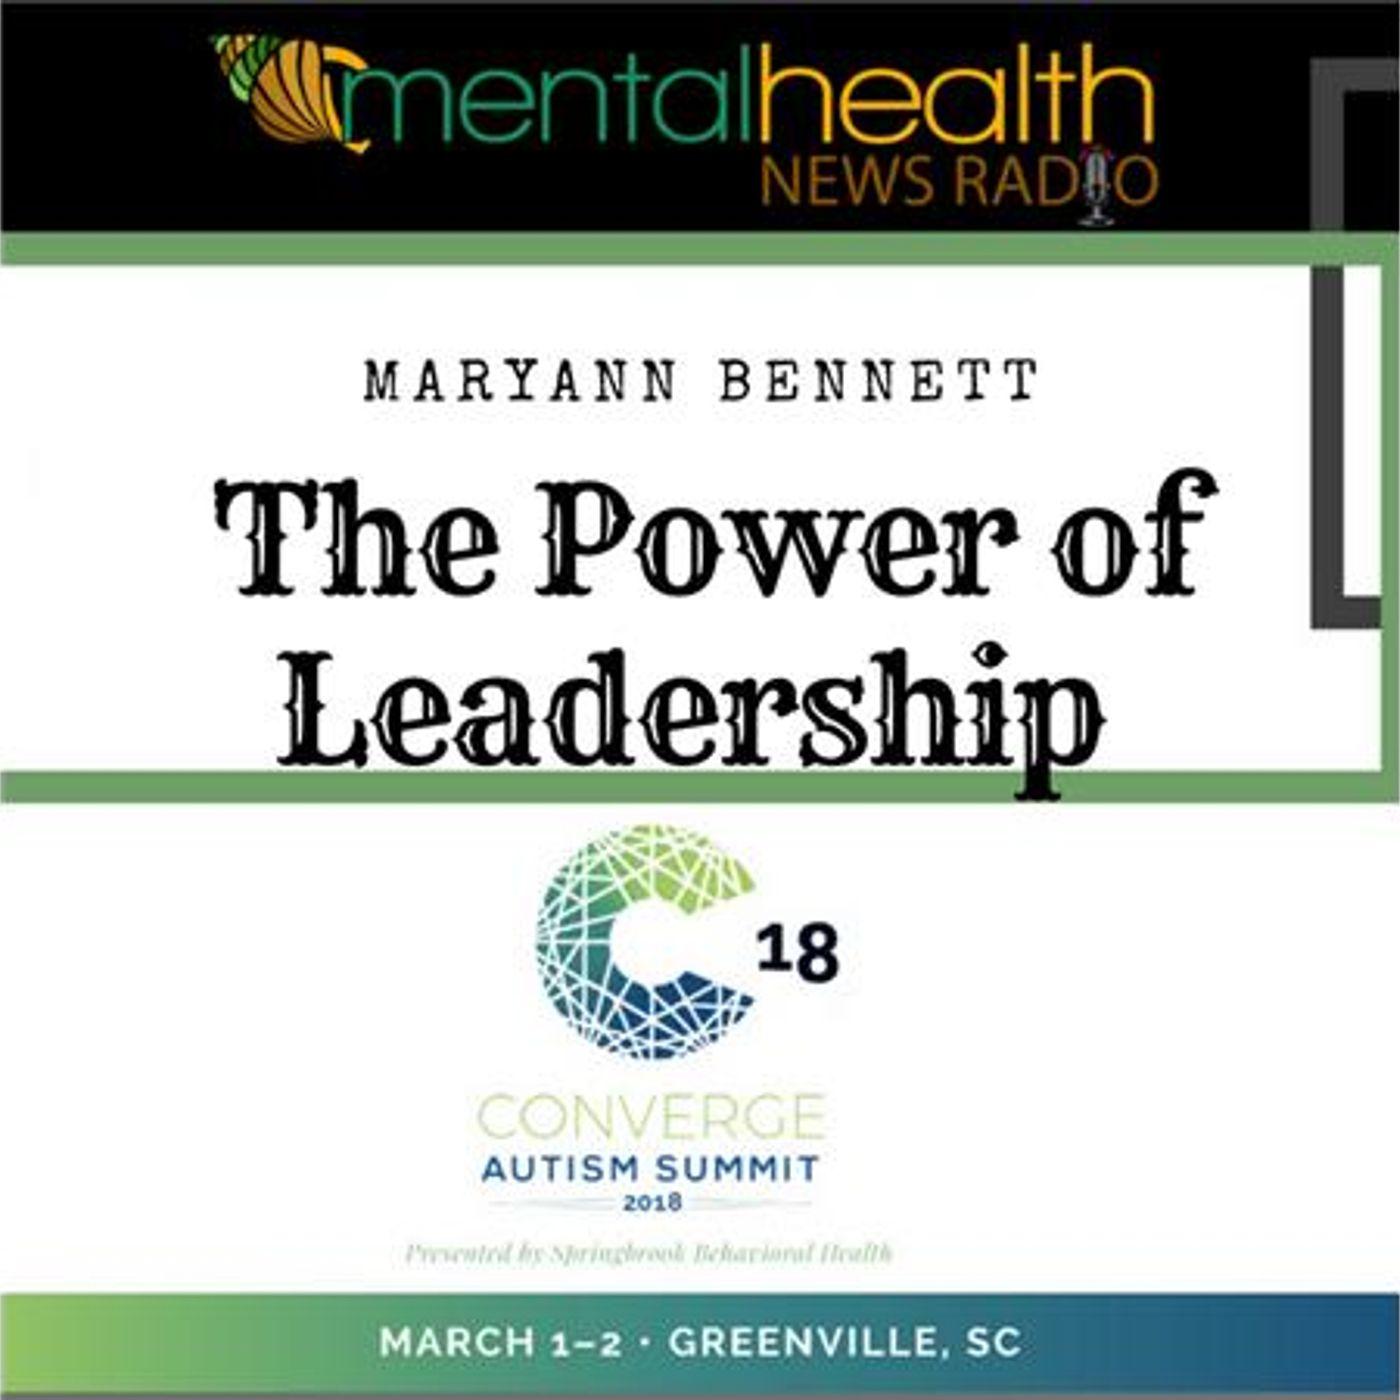 Mental Health News Radio - Converge Autism Summit: The Power of Leadership with MaryAnn Bennett